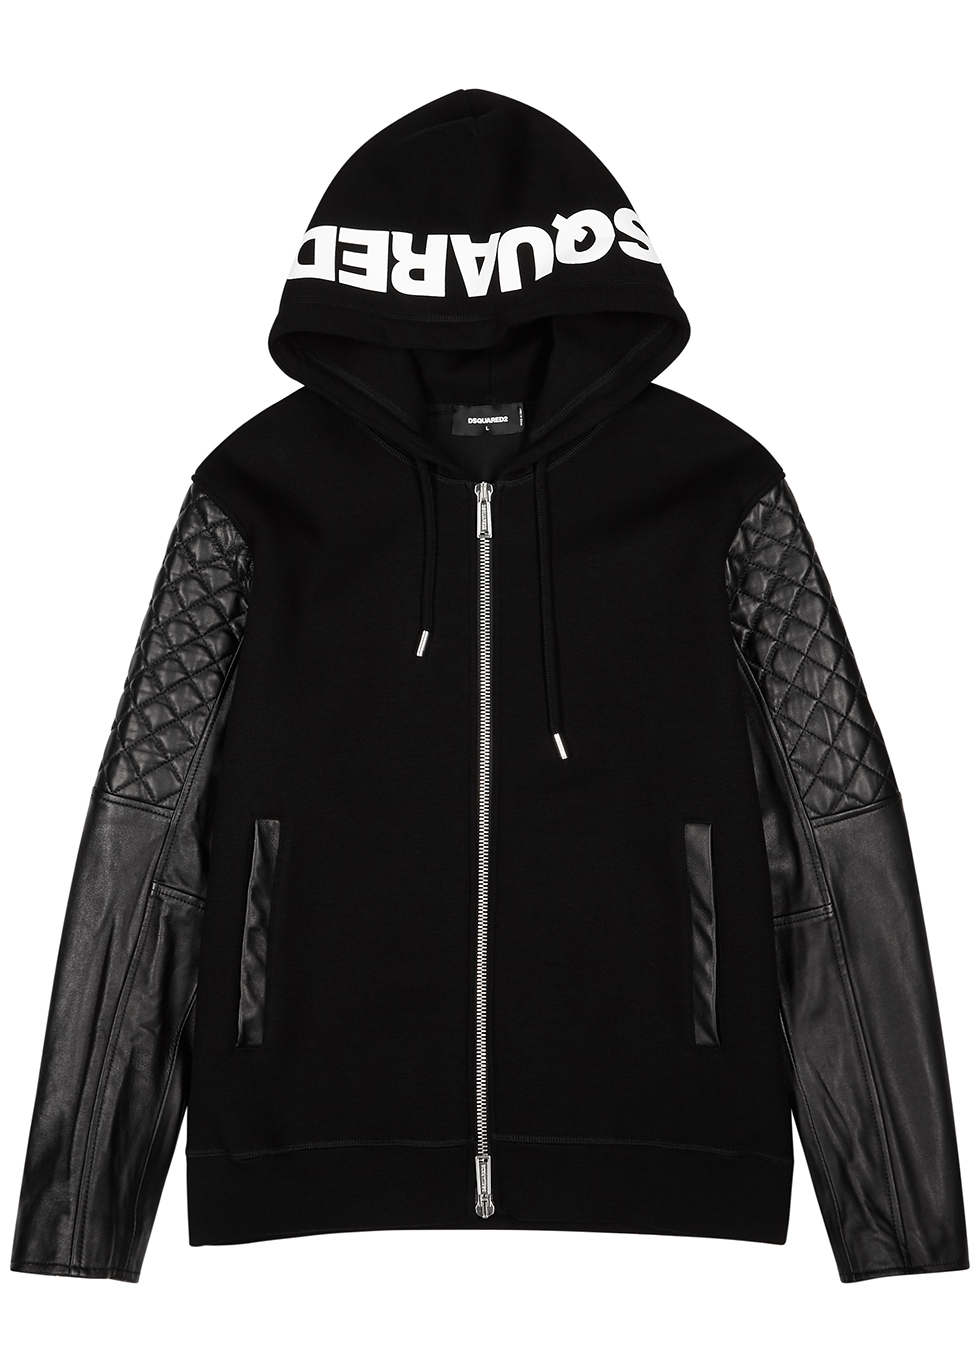 Black panelled rib-knit jacket